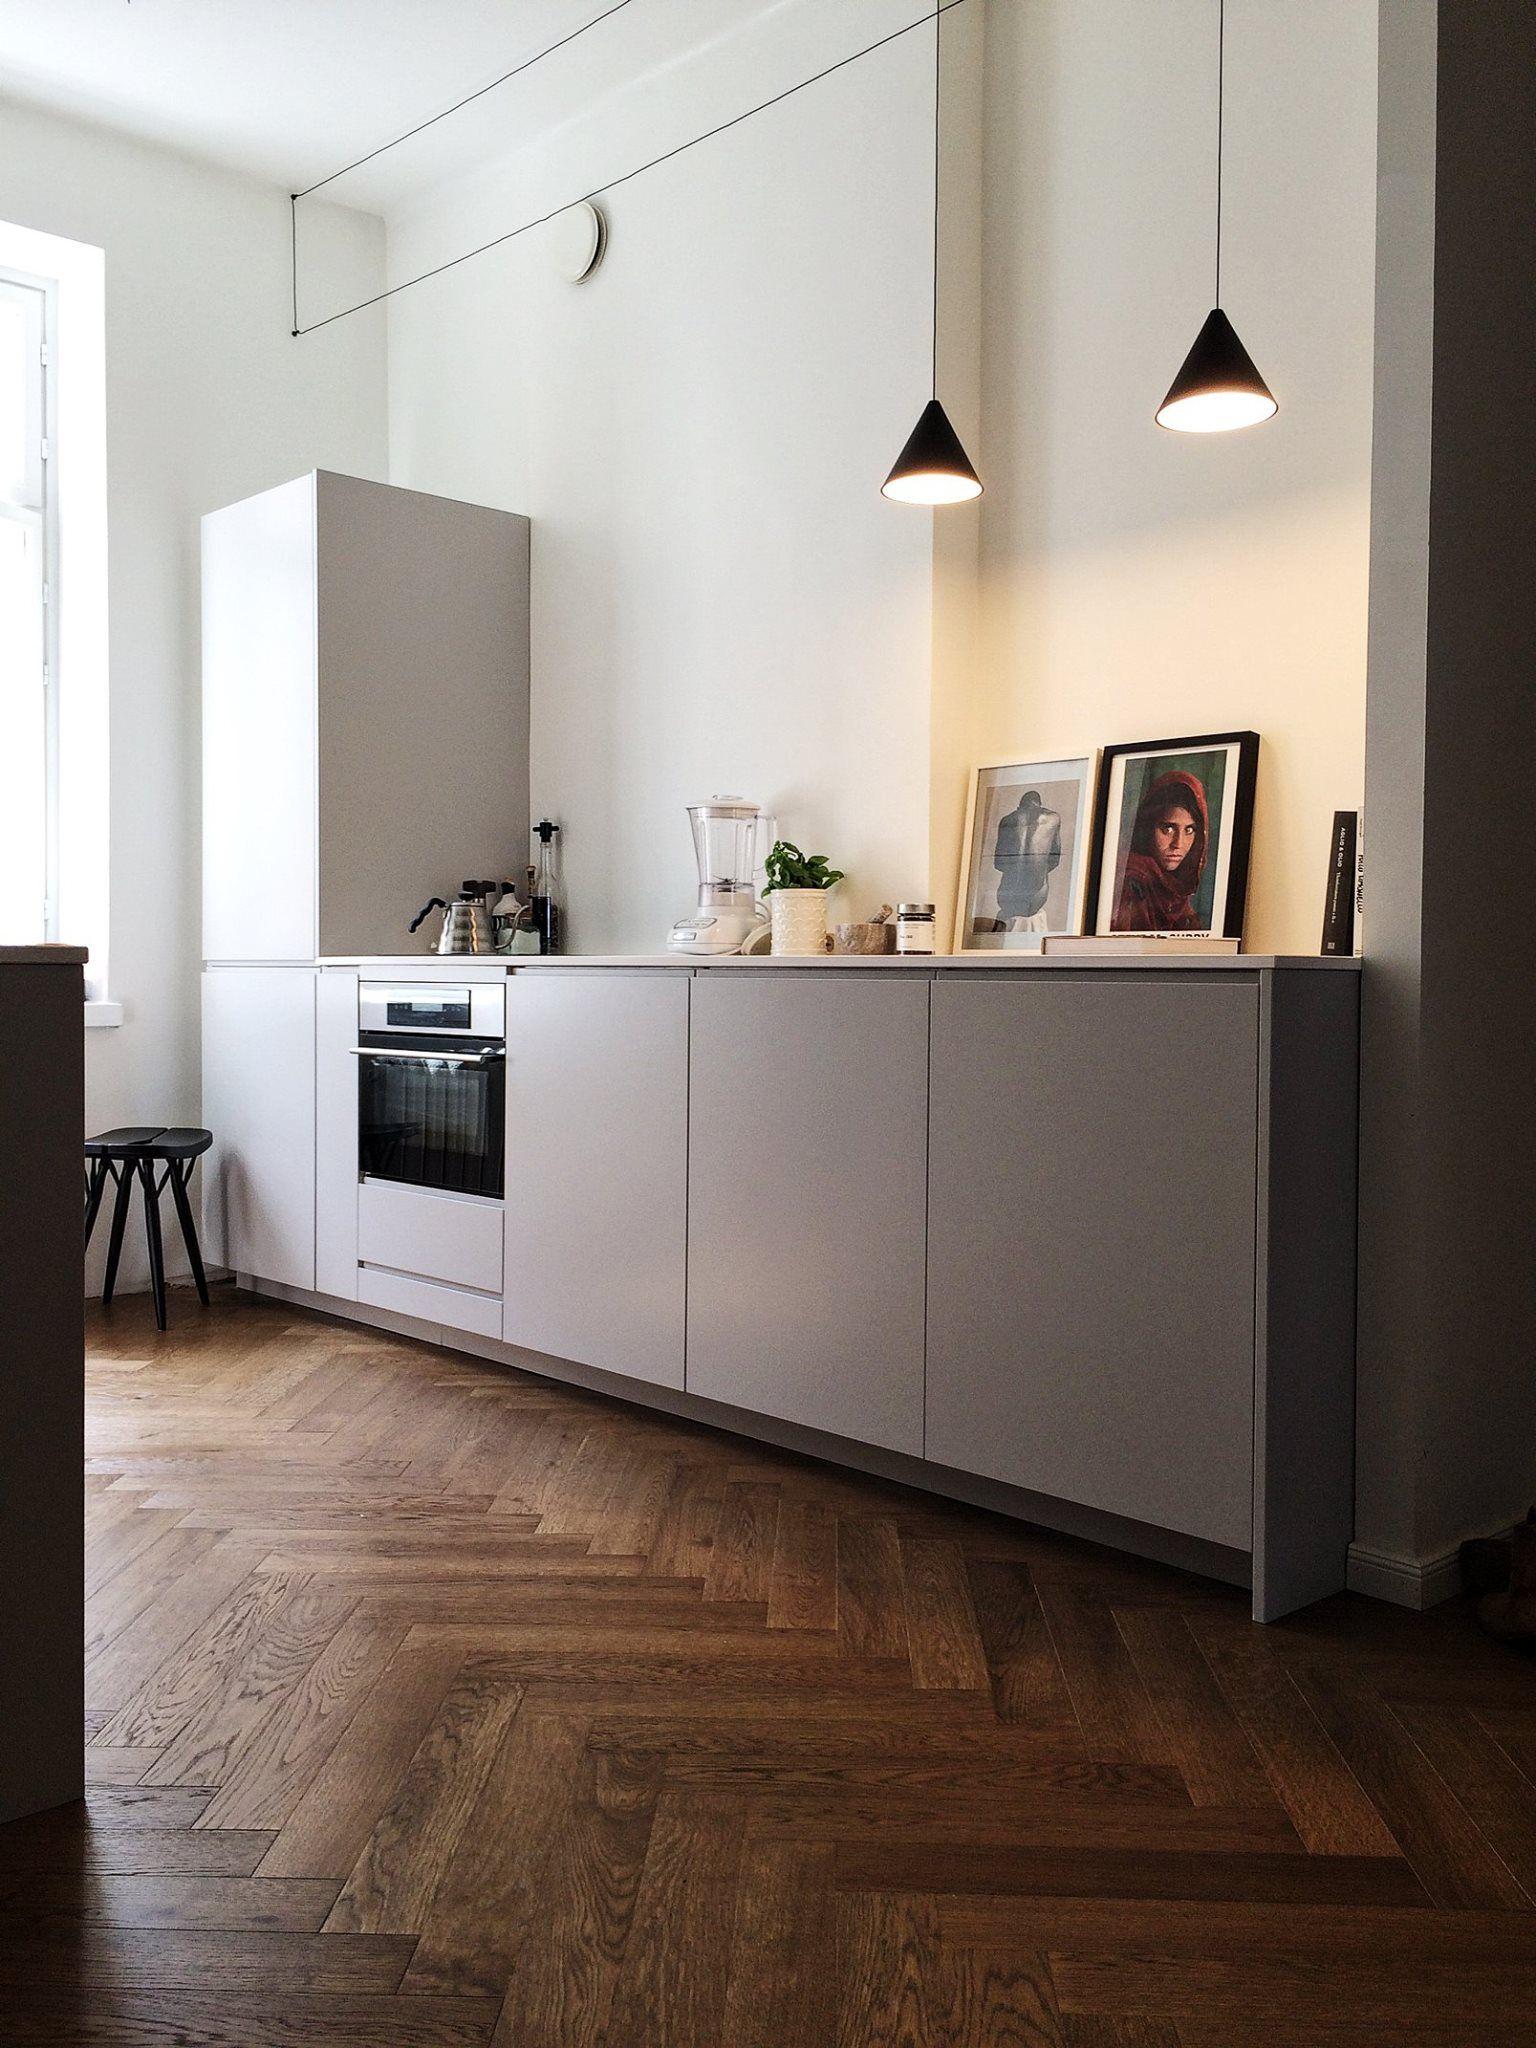 Luci cucina, fuori dal muro | My home // kitchens in 2019 | Küche ...